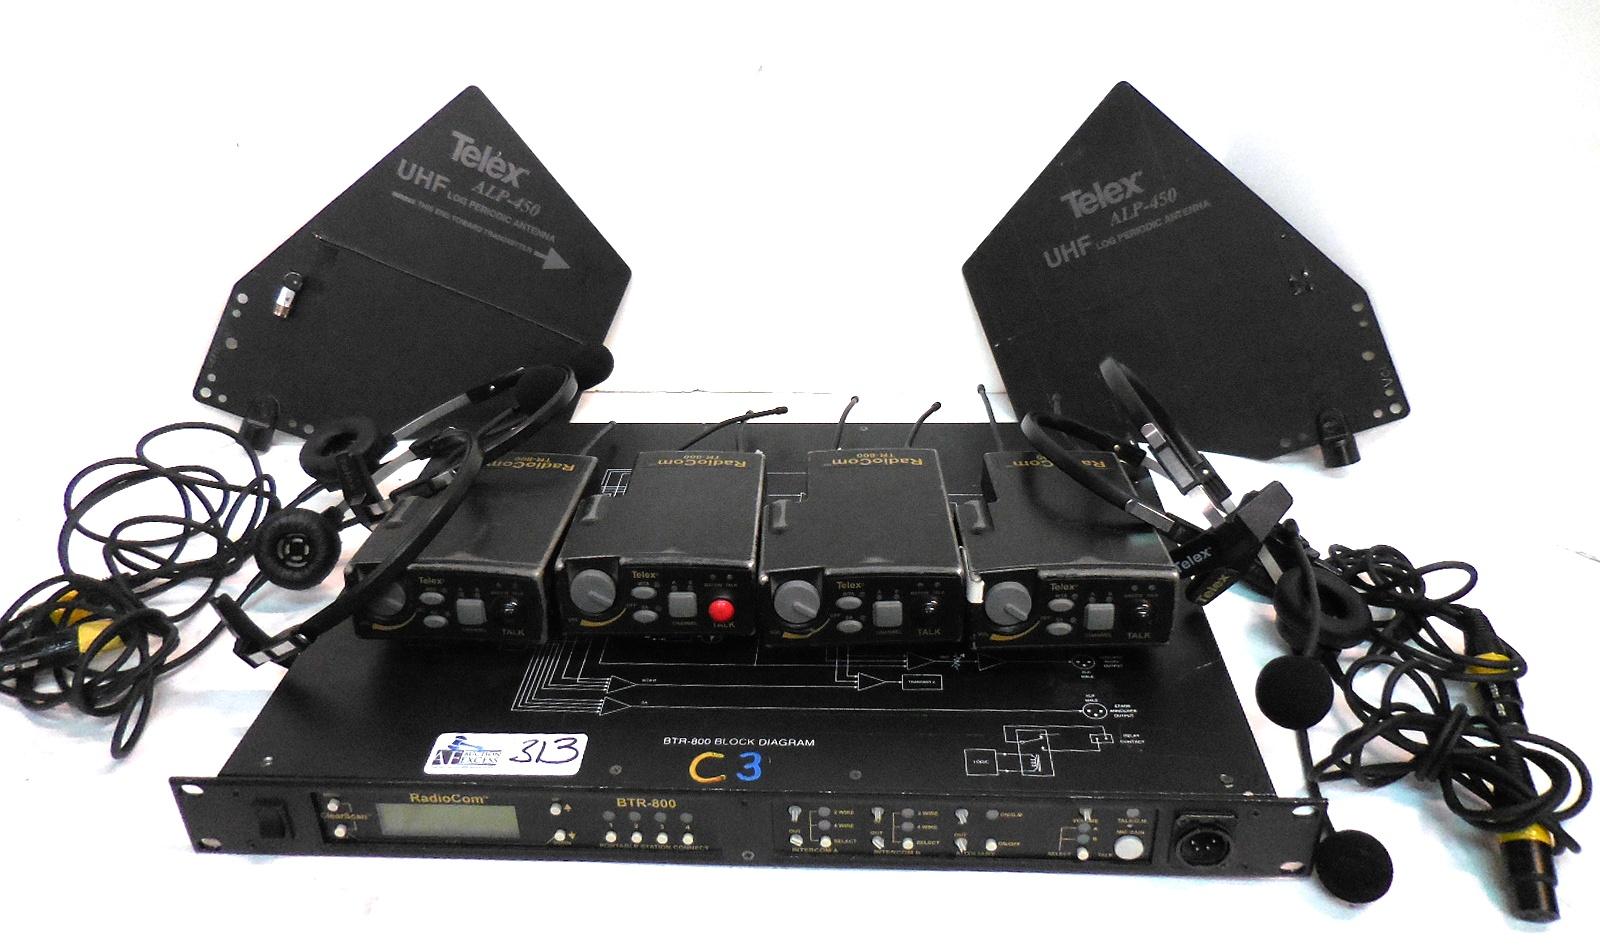 Includes 4 Tr 800 Transmitters Alp 450 Antennas And Case Sony Ccu Intercom Wiring Harness Lot 313 Rts Telex Radiocom Btr 2 Ch Uhf Synthesized Wireless